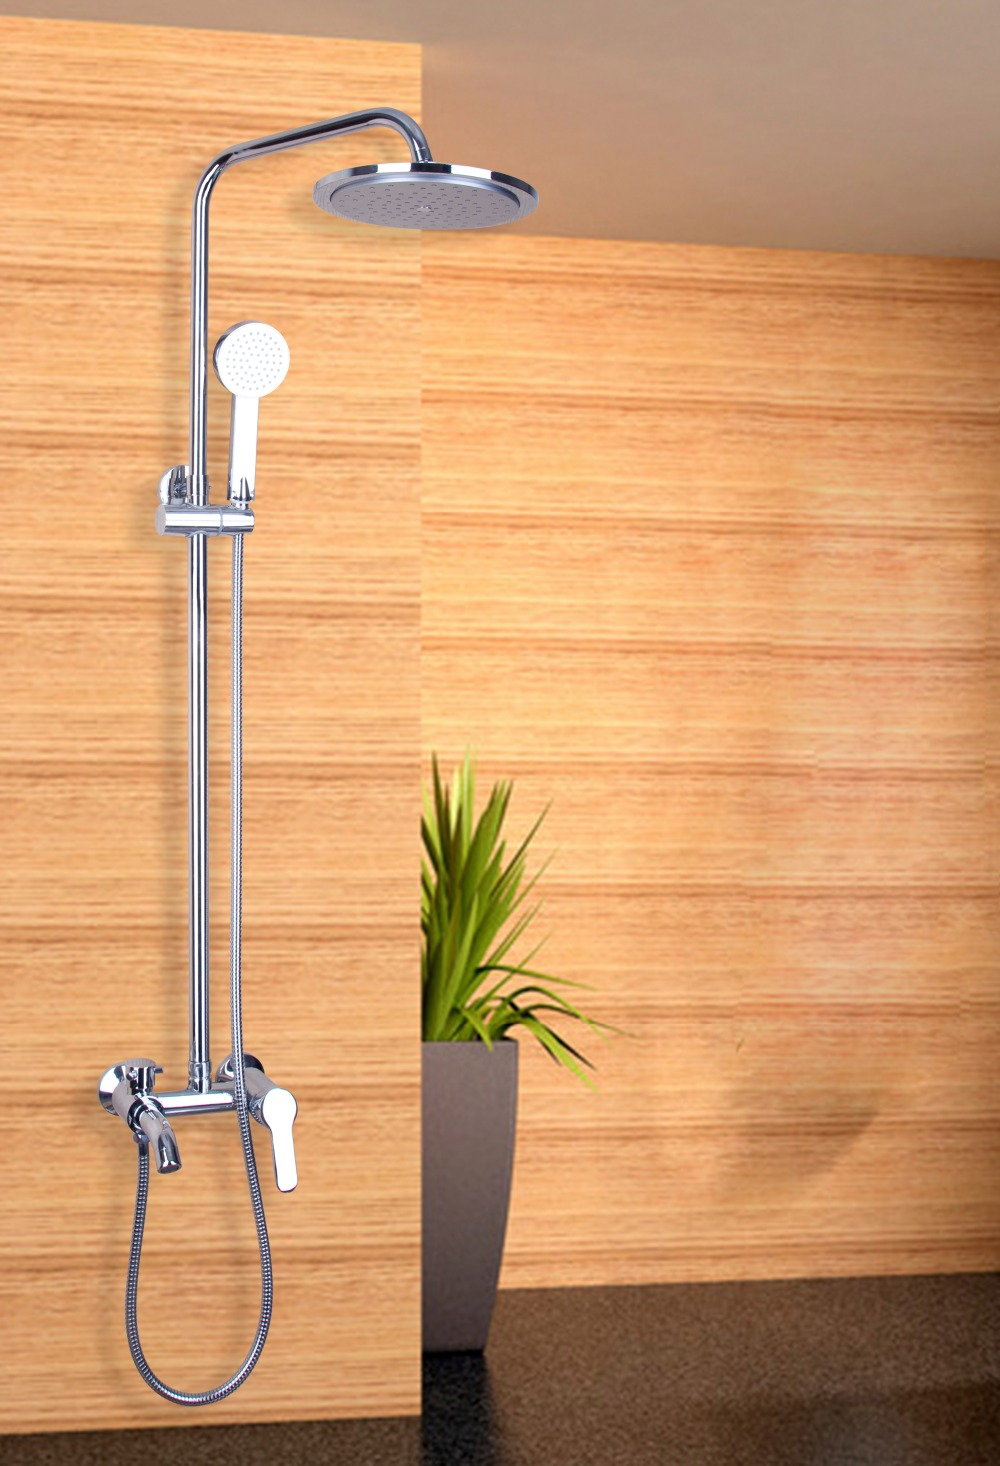 Torayvino Chrome Polished Waterfall Rain Shower Faucet & Hand Shower Wall Mounted Single Handle Bathroom Faucet Mixer Tap free shipping polished chrome finish new wall mounted waterfall bathroom bathtub handheld shower tap mixer faucet yt 5333